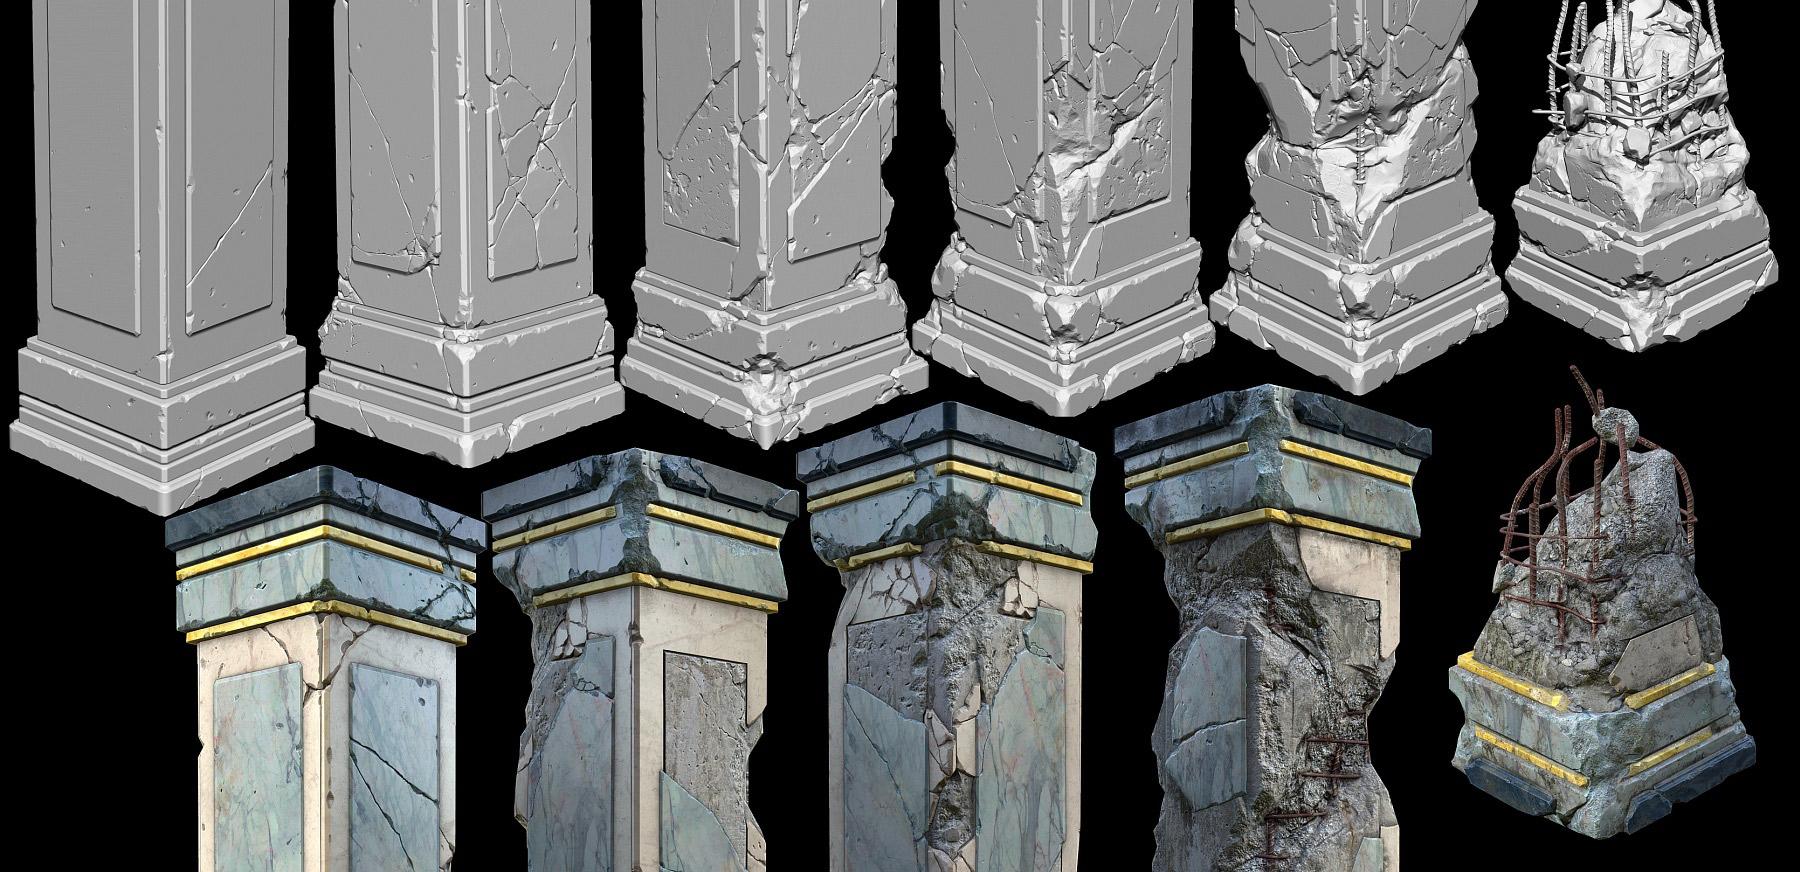 Broken Stone Pillar : Damaged marble pillars including resources zbrushes